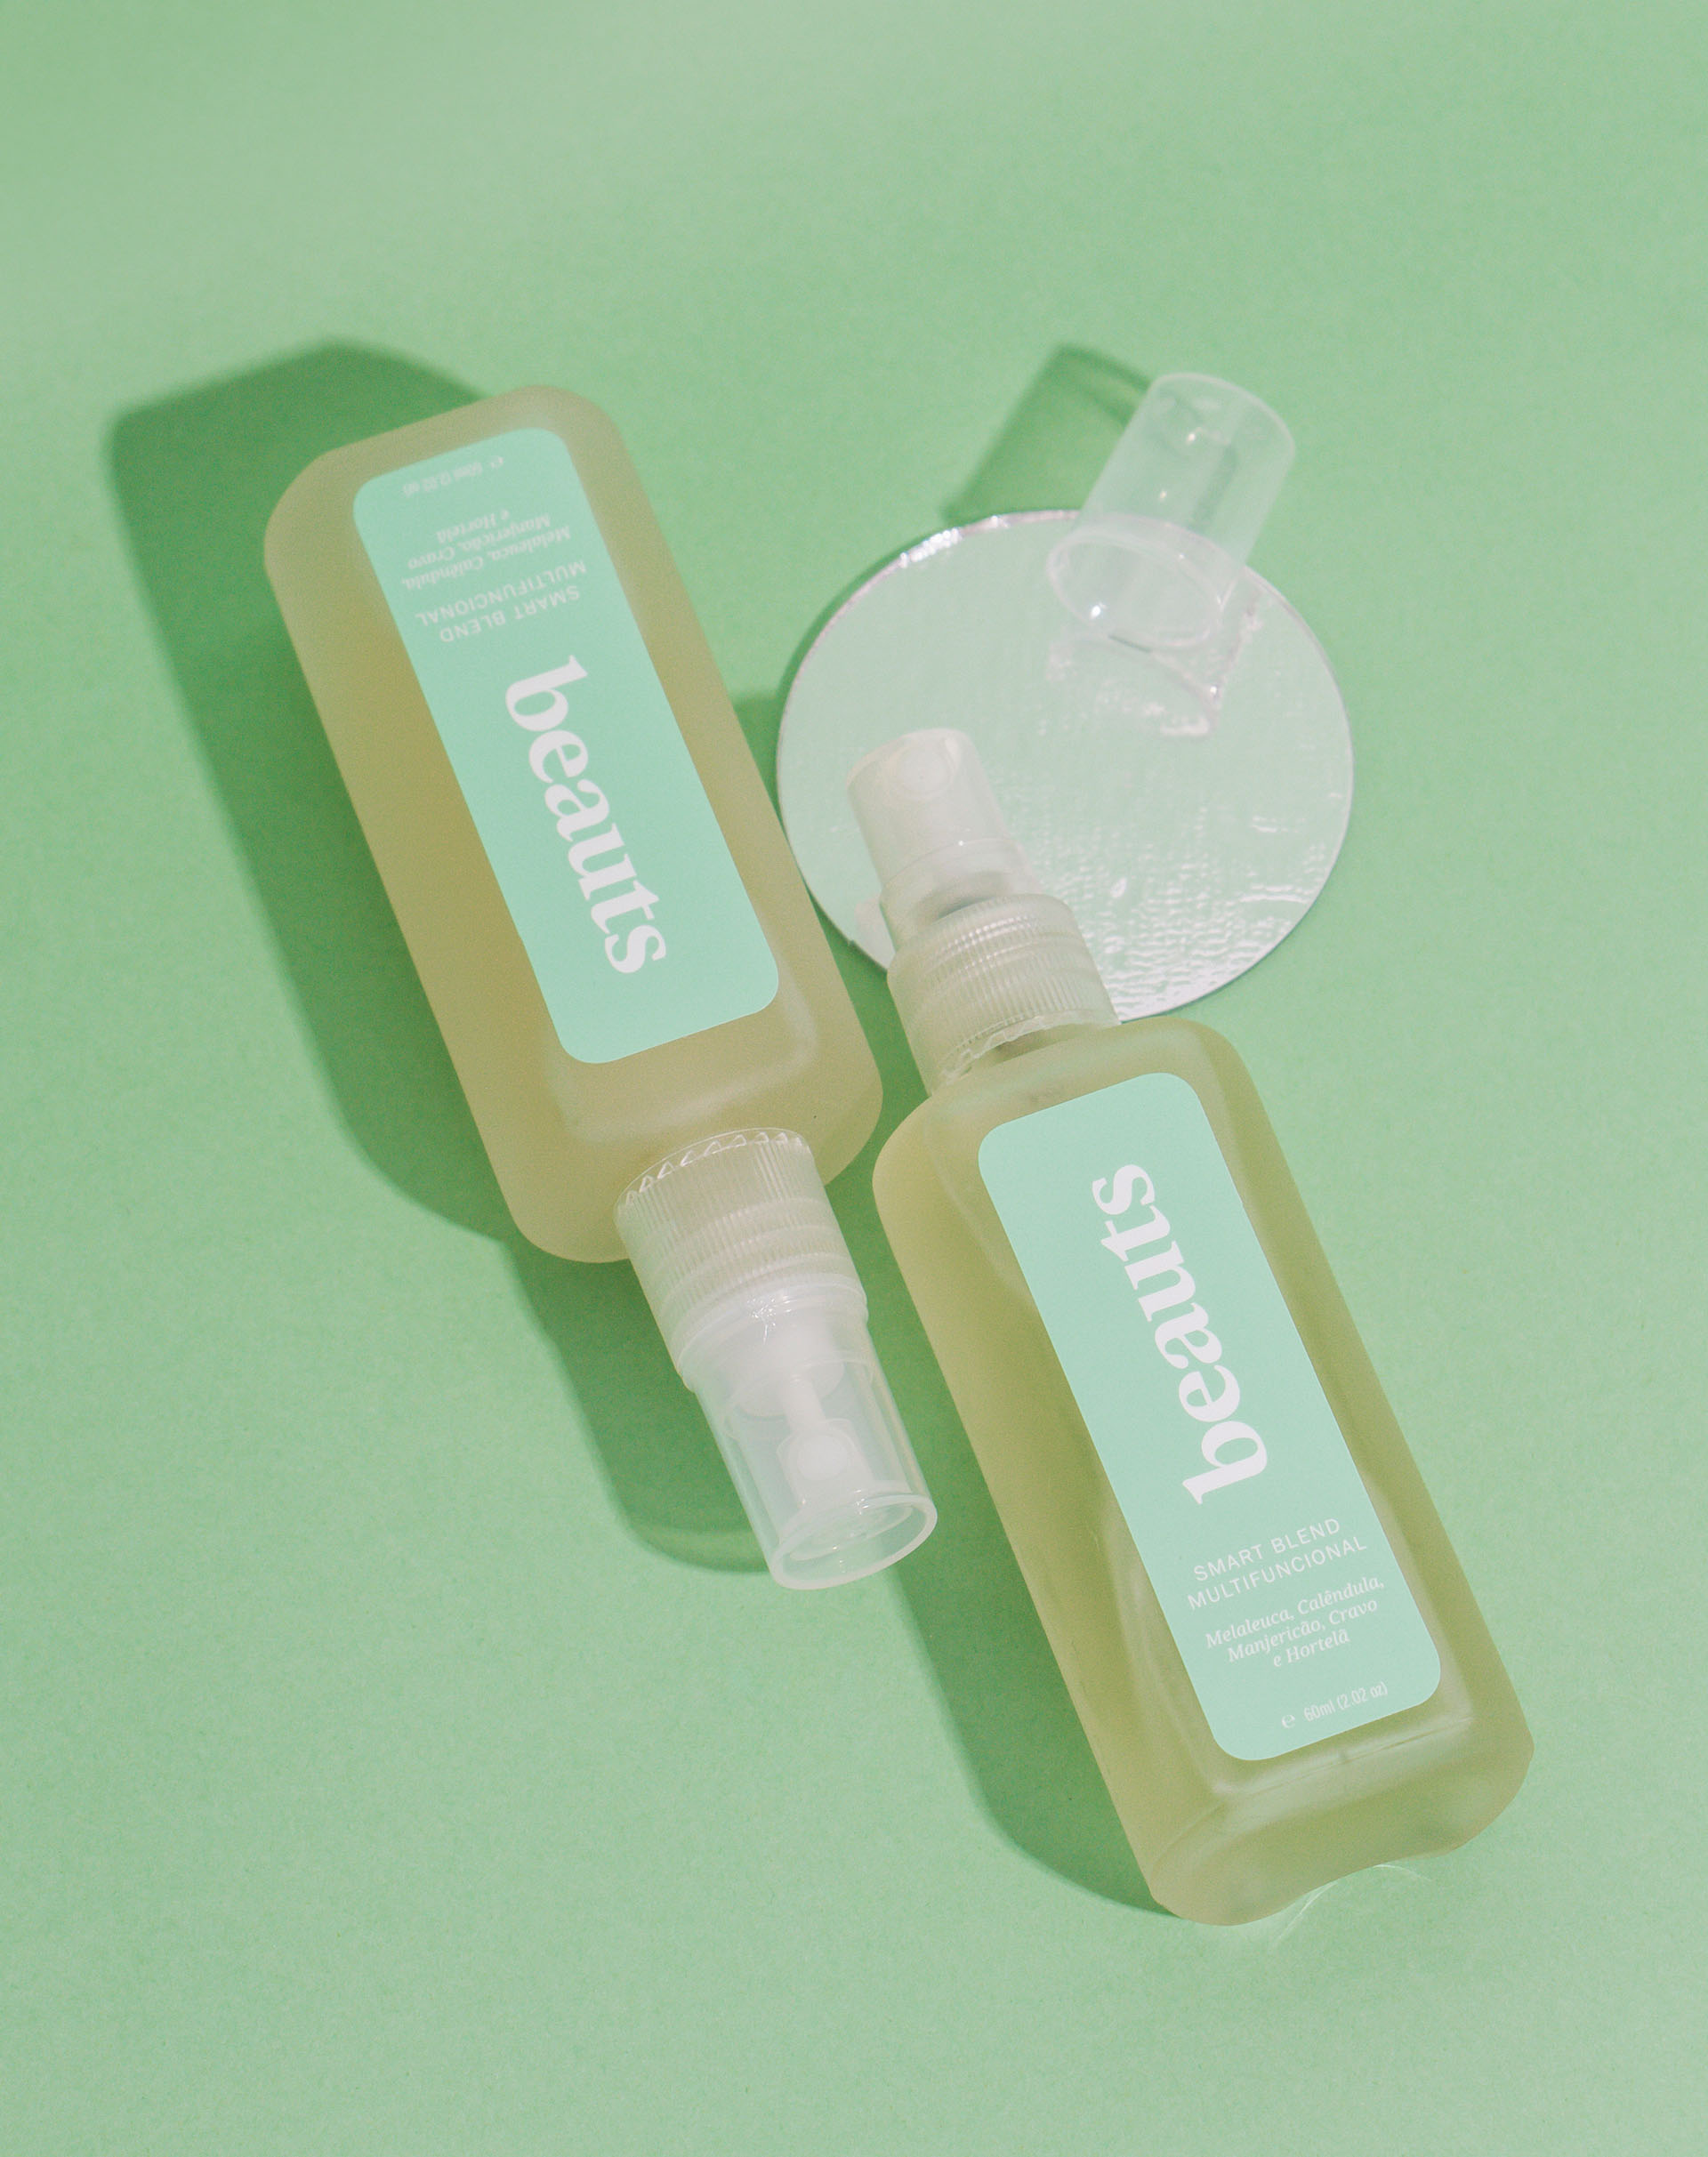 BEAUTS SMART GREEN WATER MULTIFUNCIONAL - 120ML